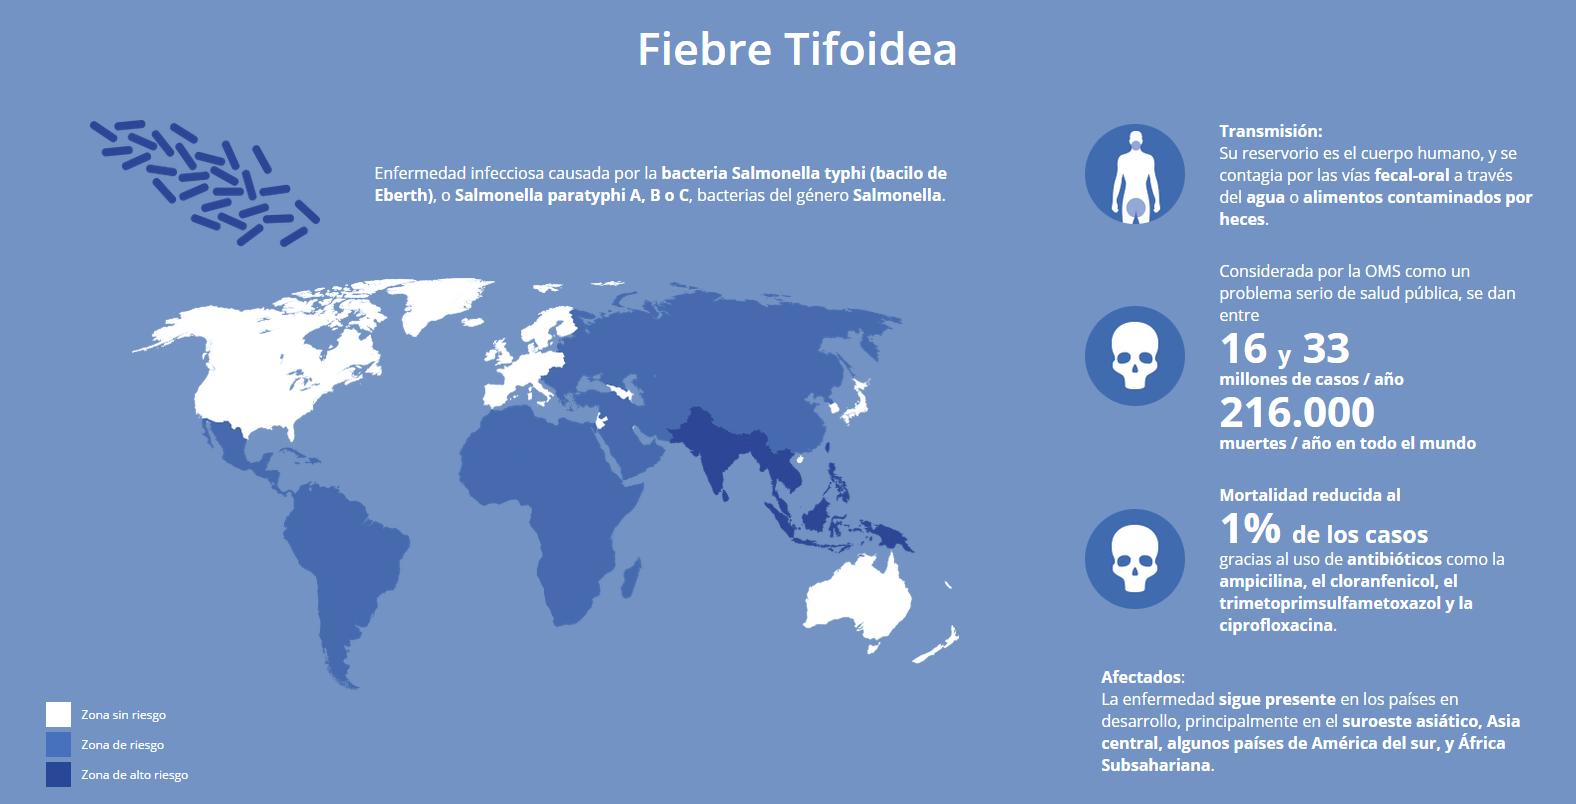 fiebretifoidea.png